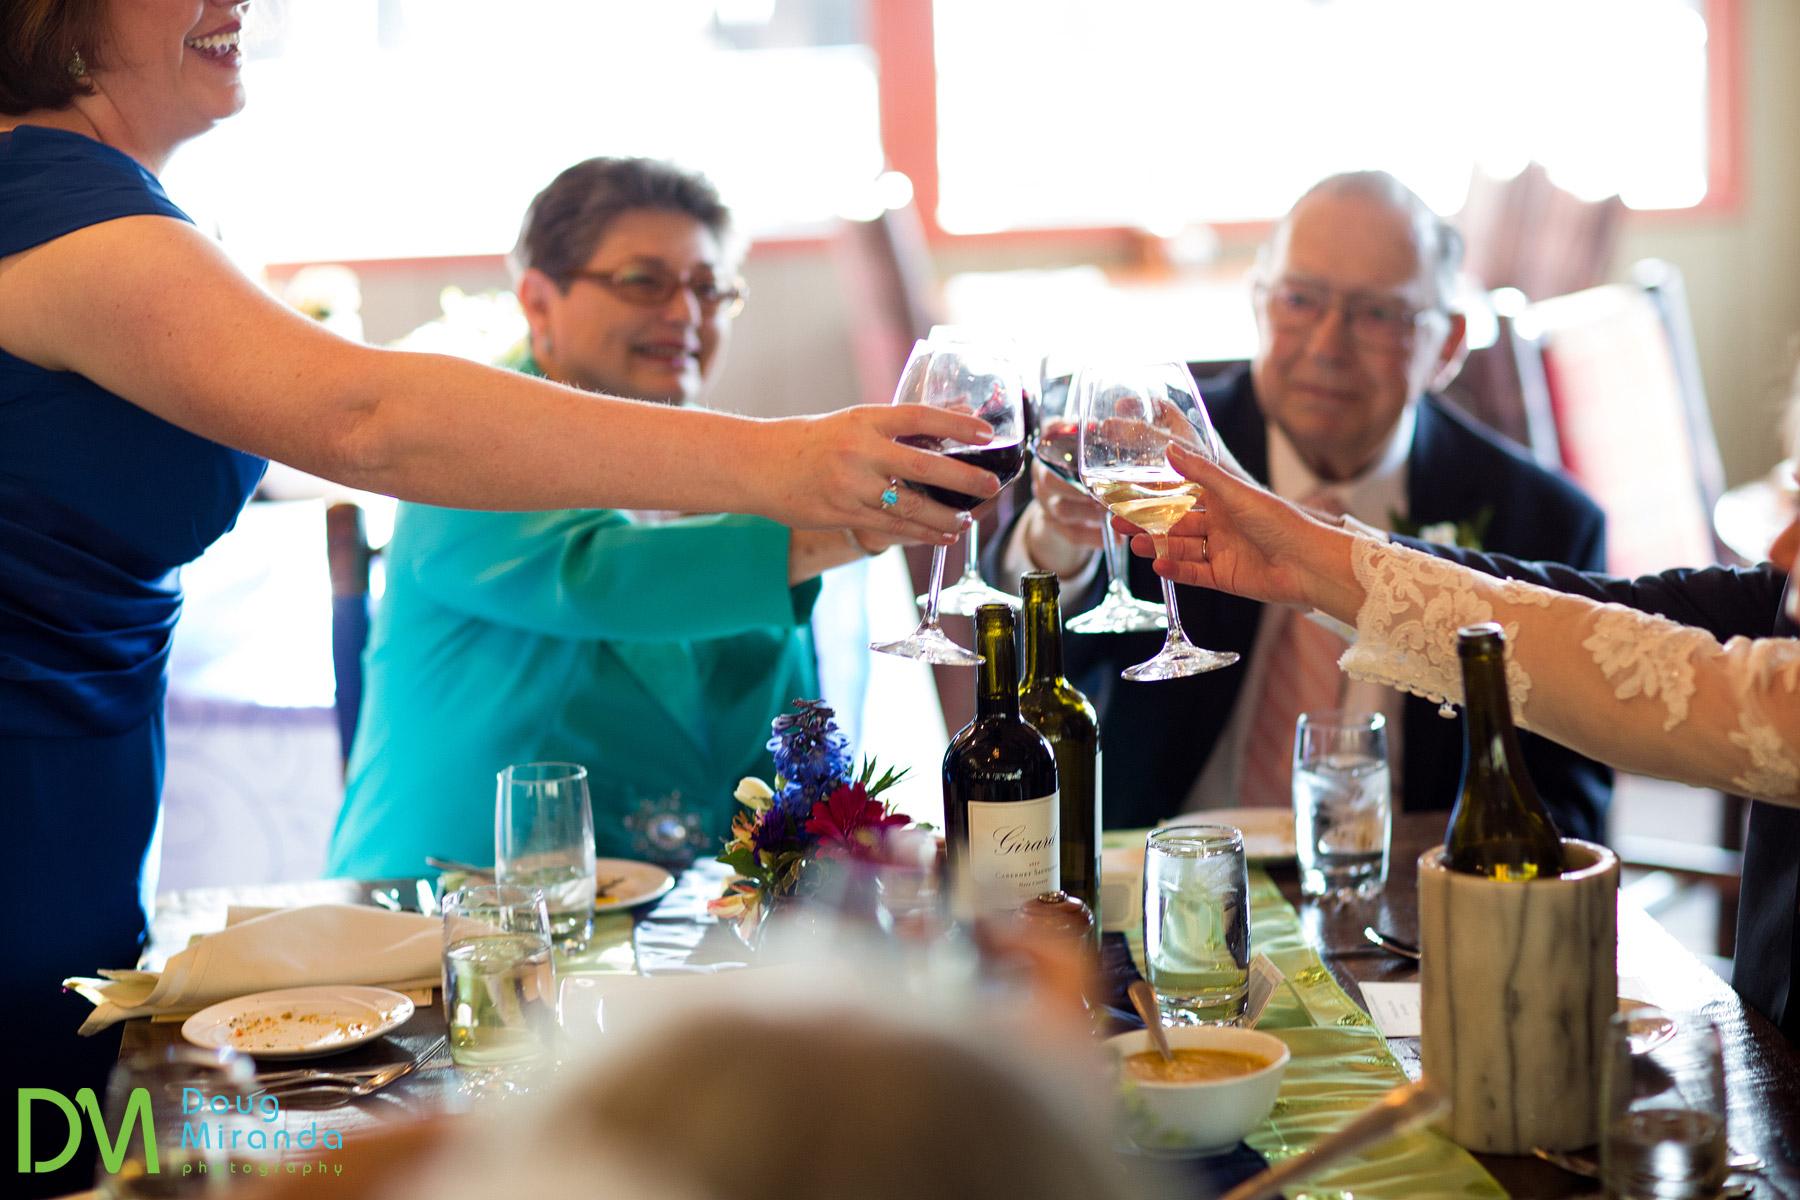 zephyr cove resort restaurant photos